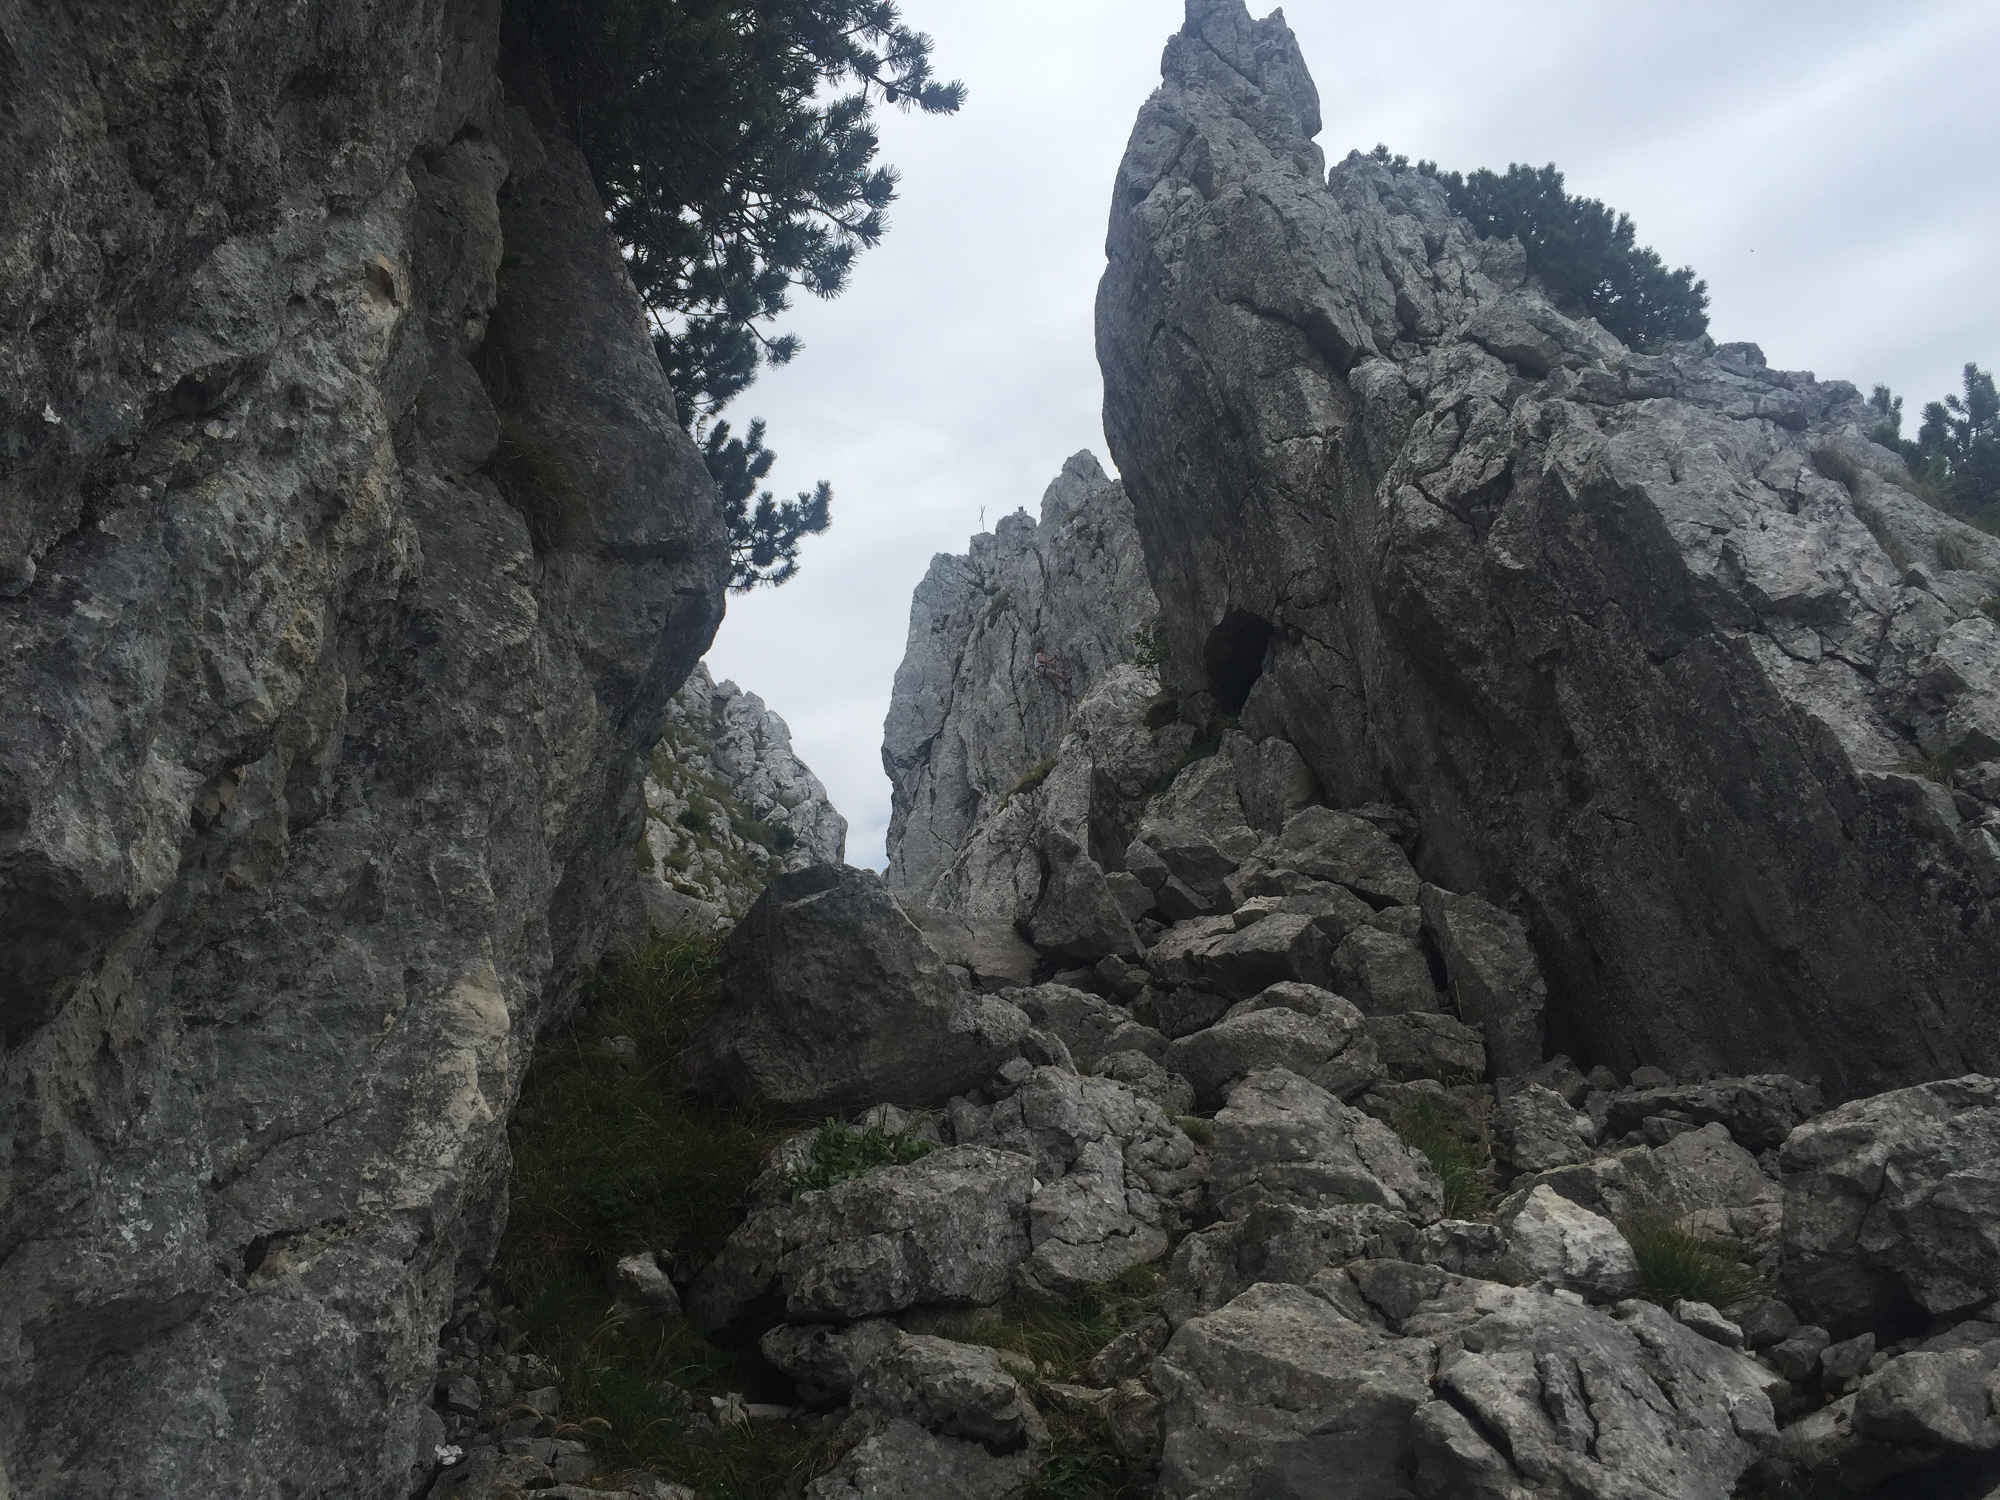 Klettersteig Tegernsee : Wanderung zur tegernseer hütte im frühling